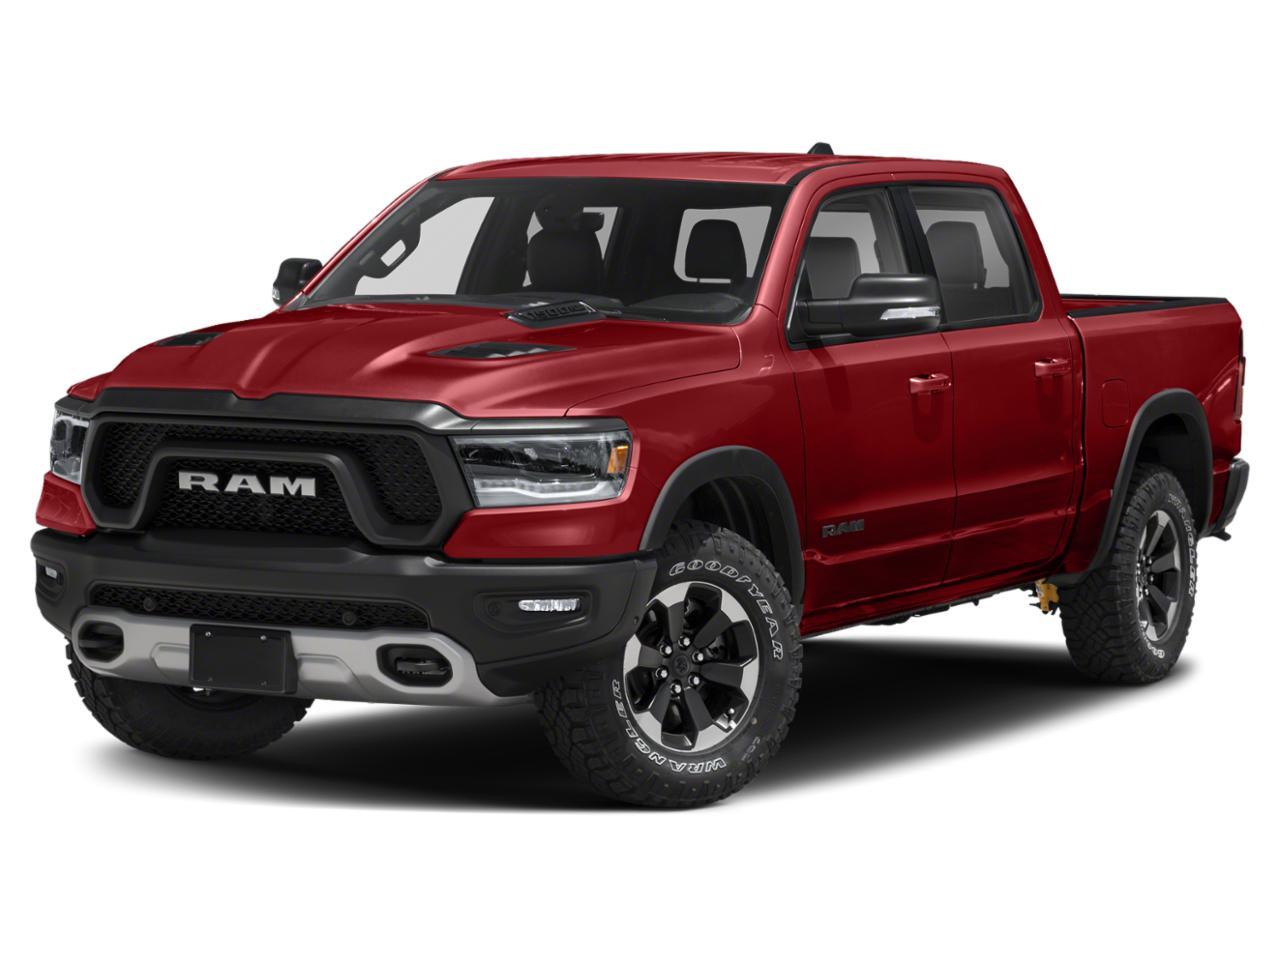 2021 Ram 1500 Vehicle Photo in Raton, NM 87740